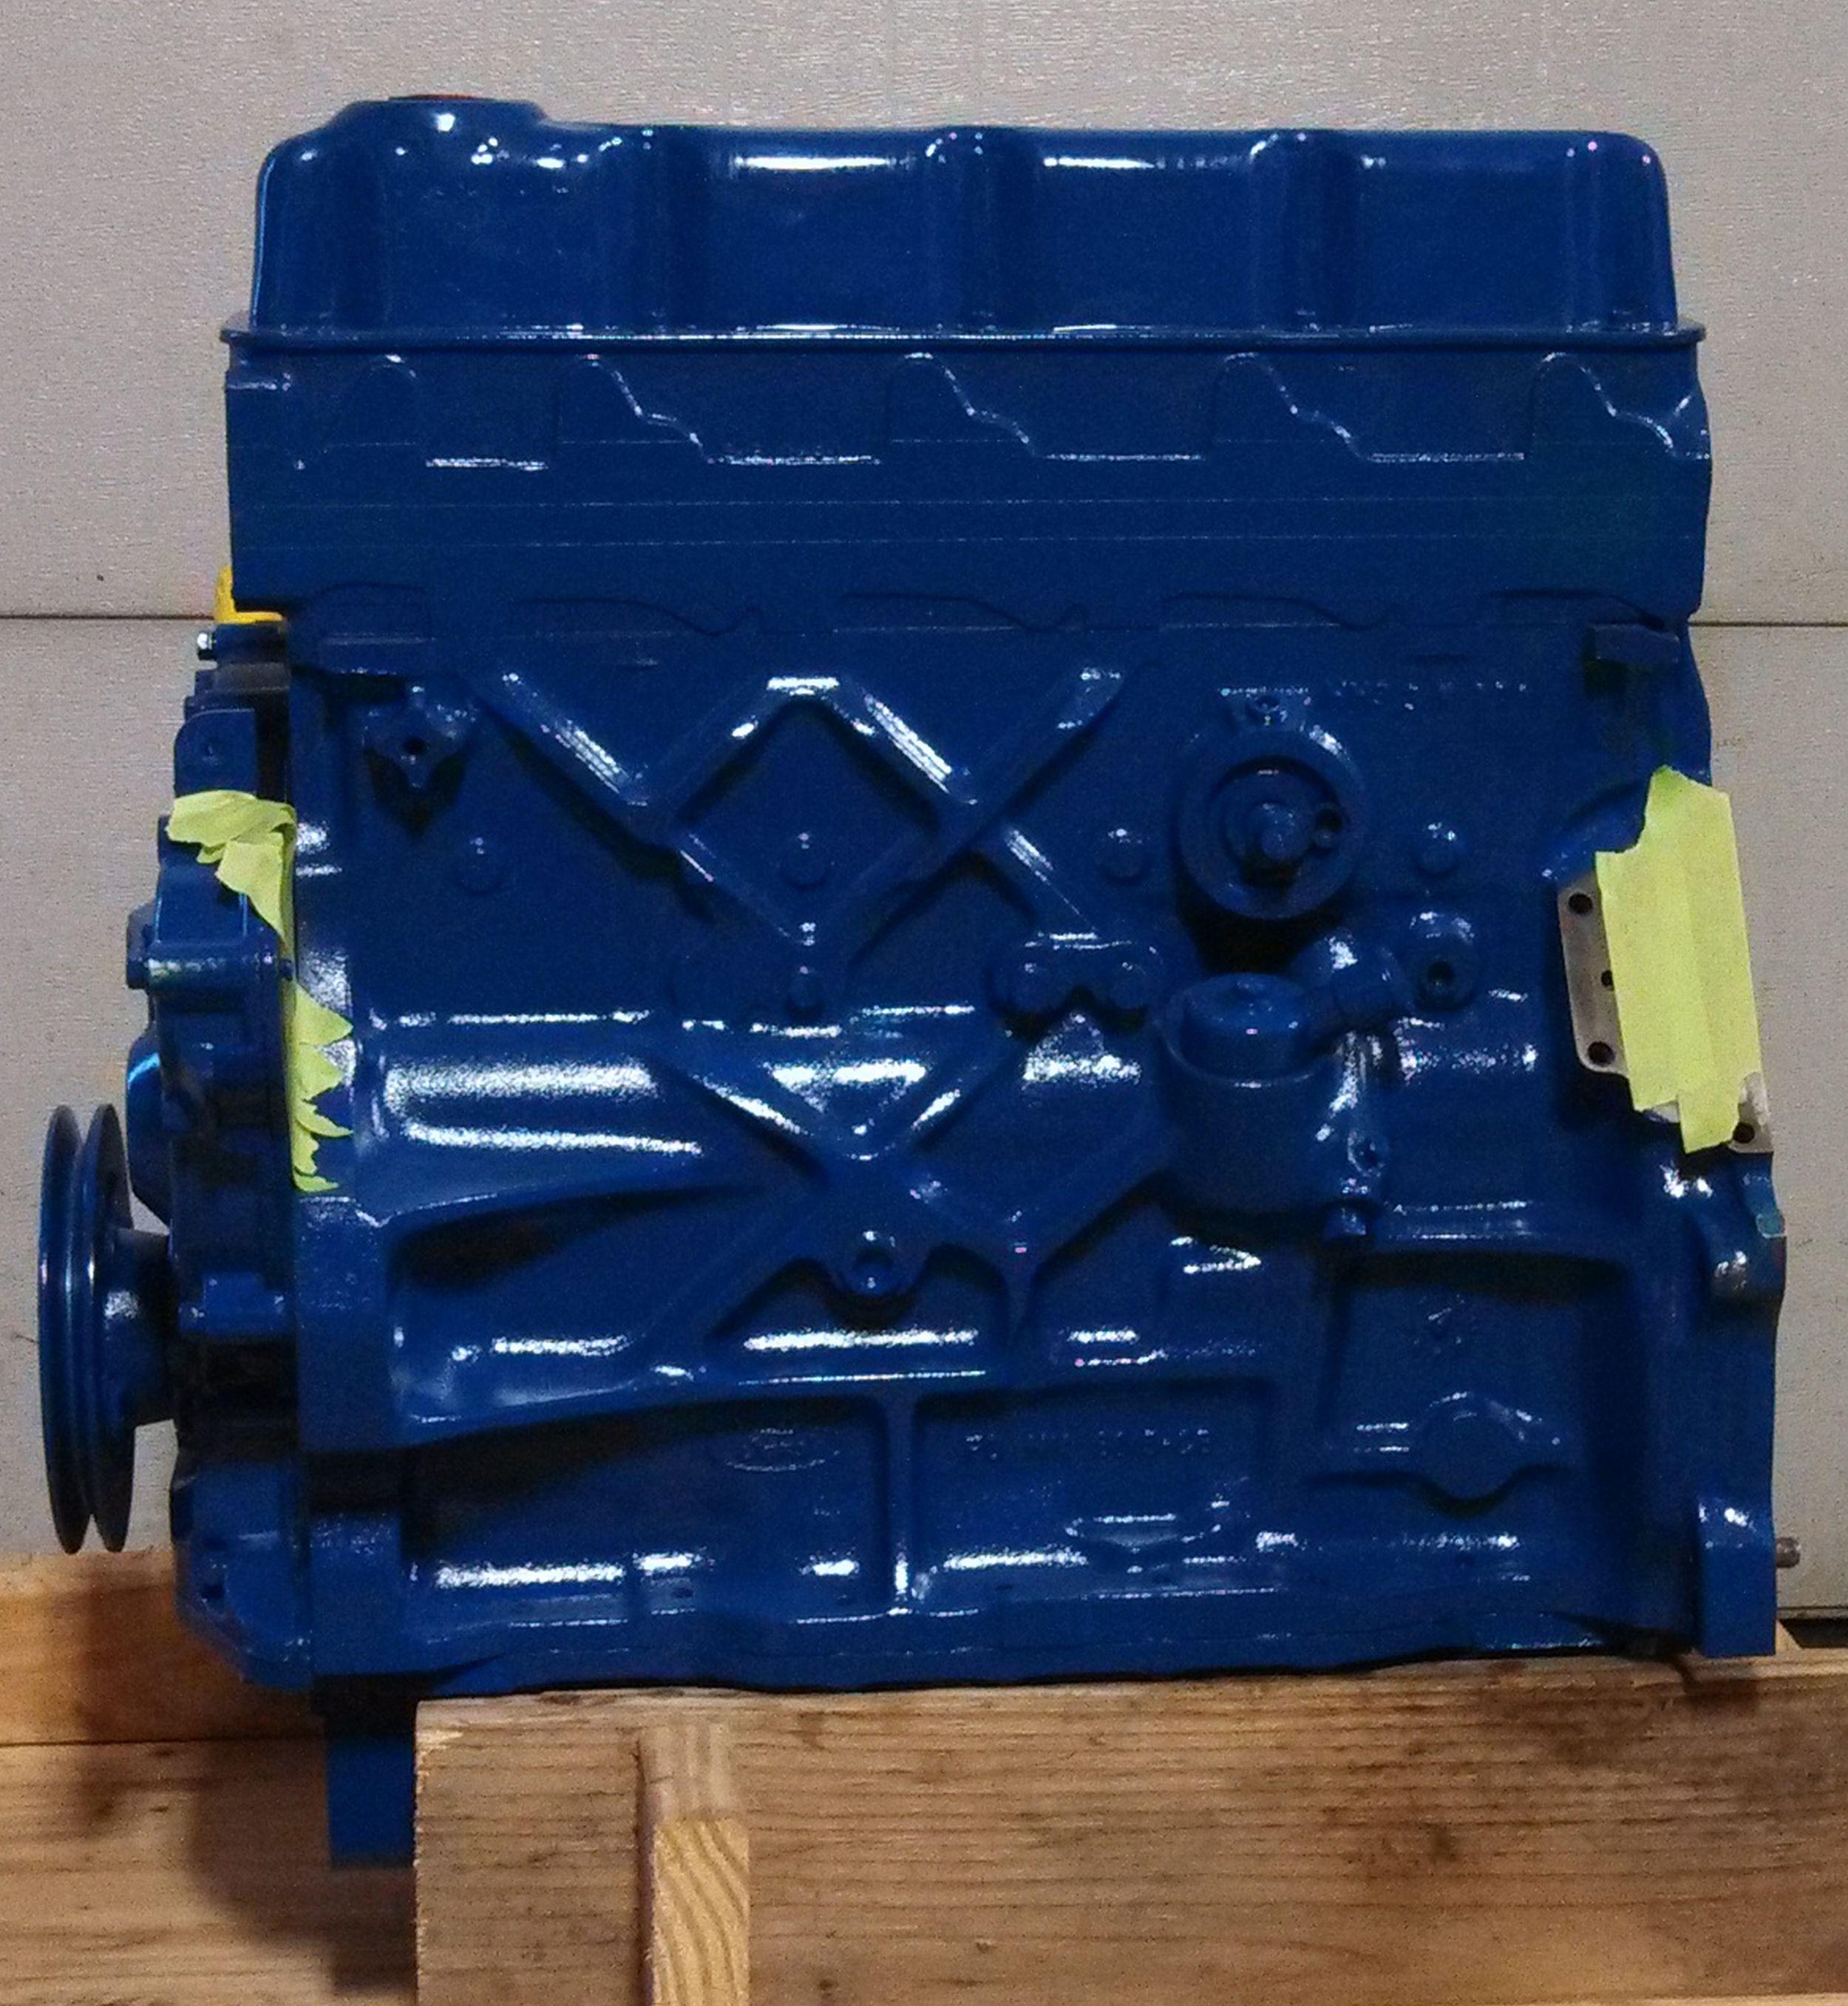 Engine Long Block Reman Ford Newholland 256n 4 Cyl Diesel